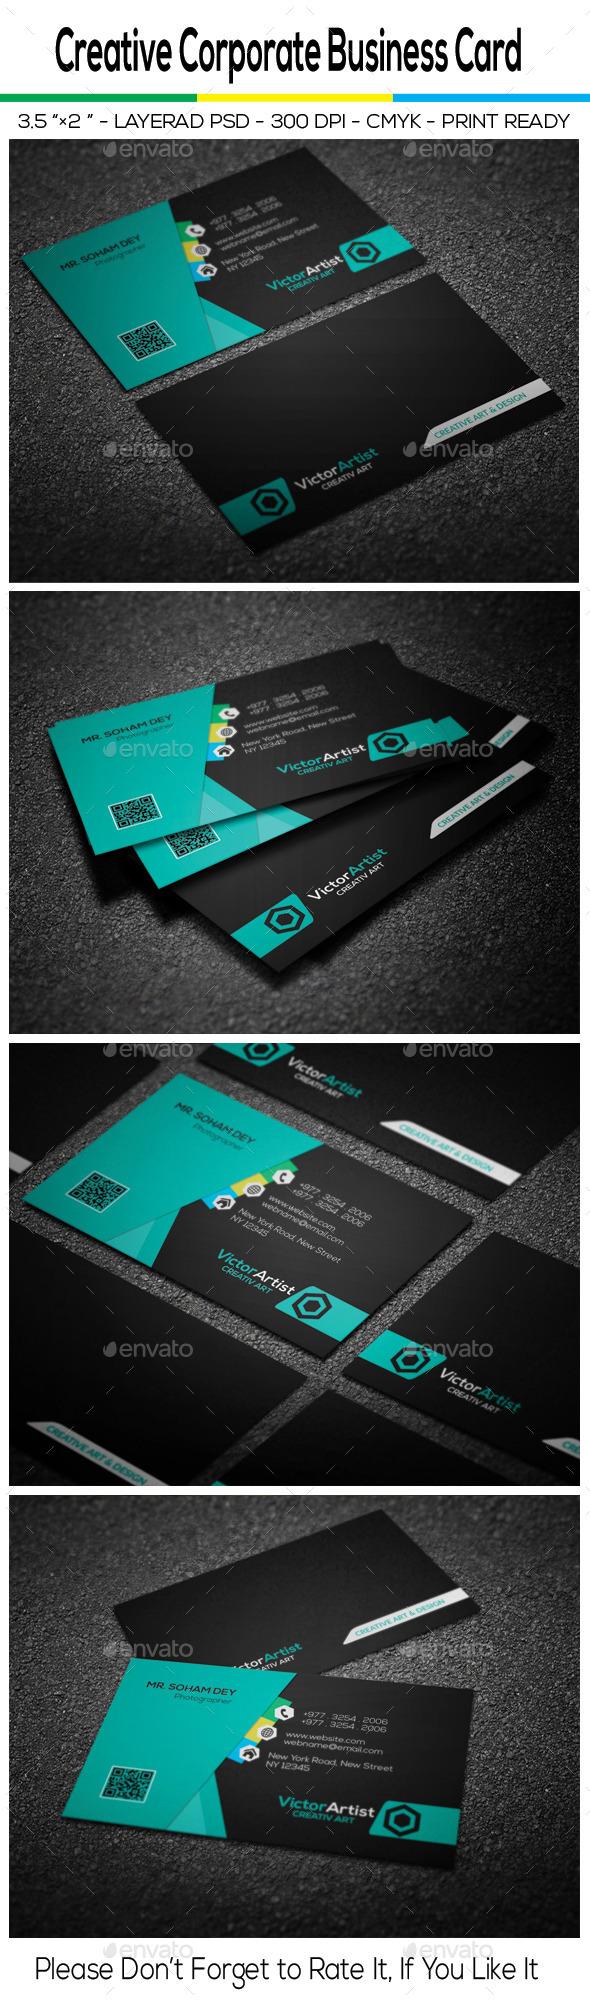 GraphicRiver Creative Corporate Business Card 10359385